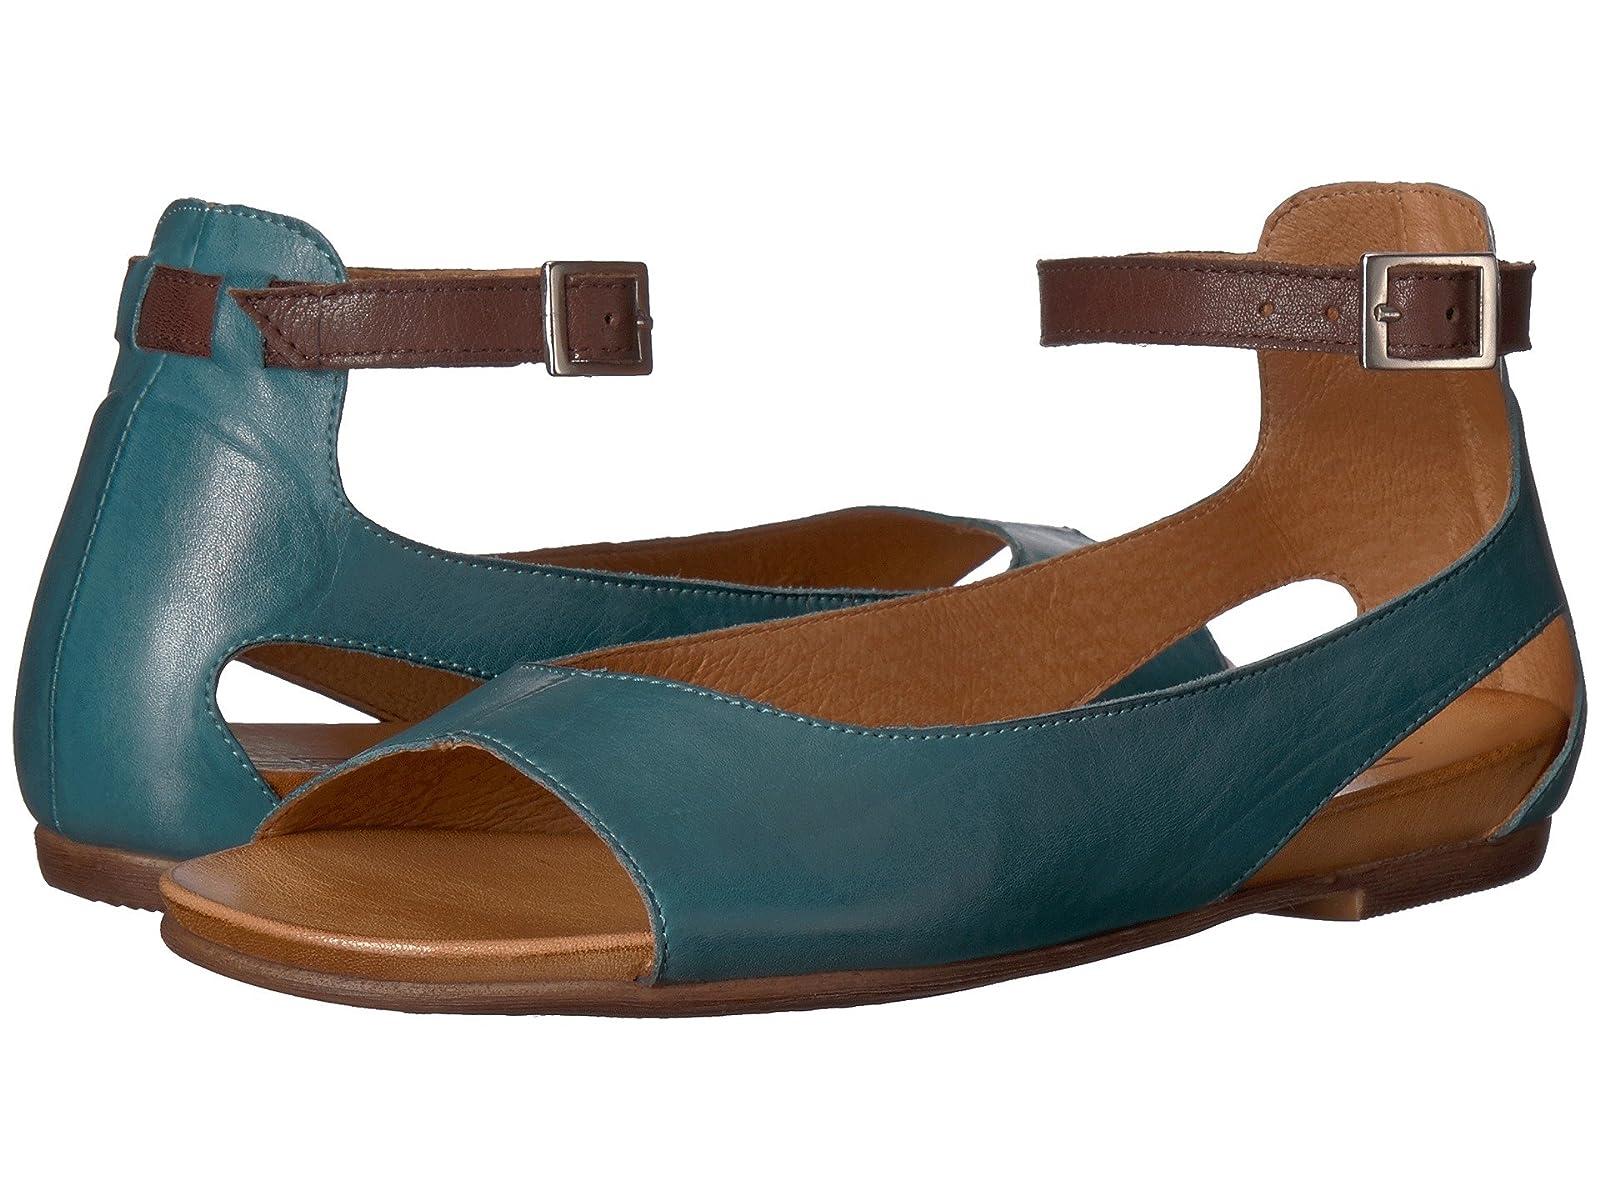 Miz Mooz AngelAtmospheric grades have affordable shoes